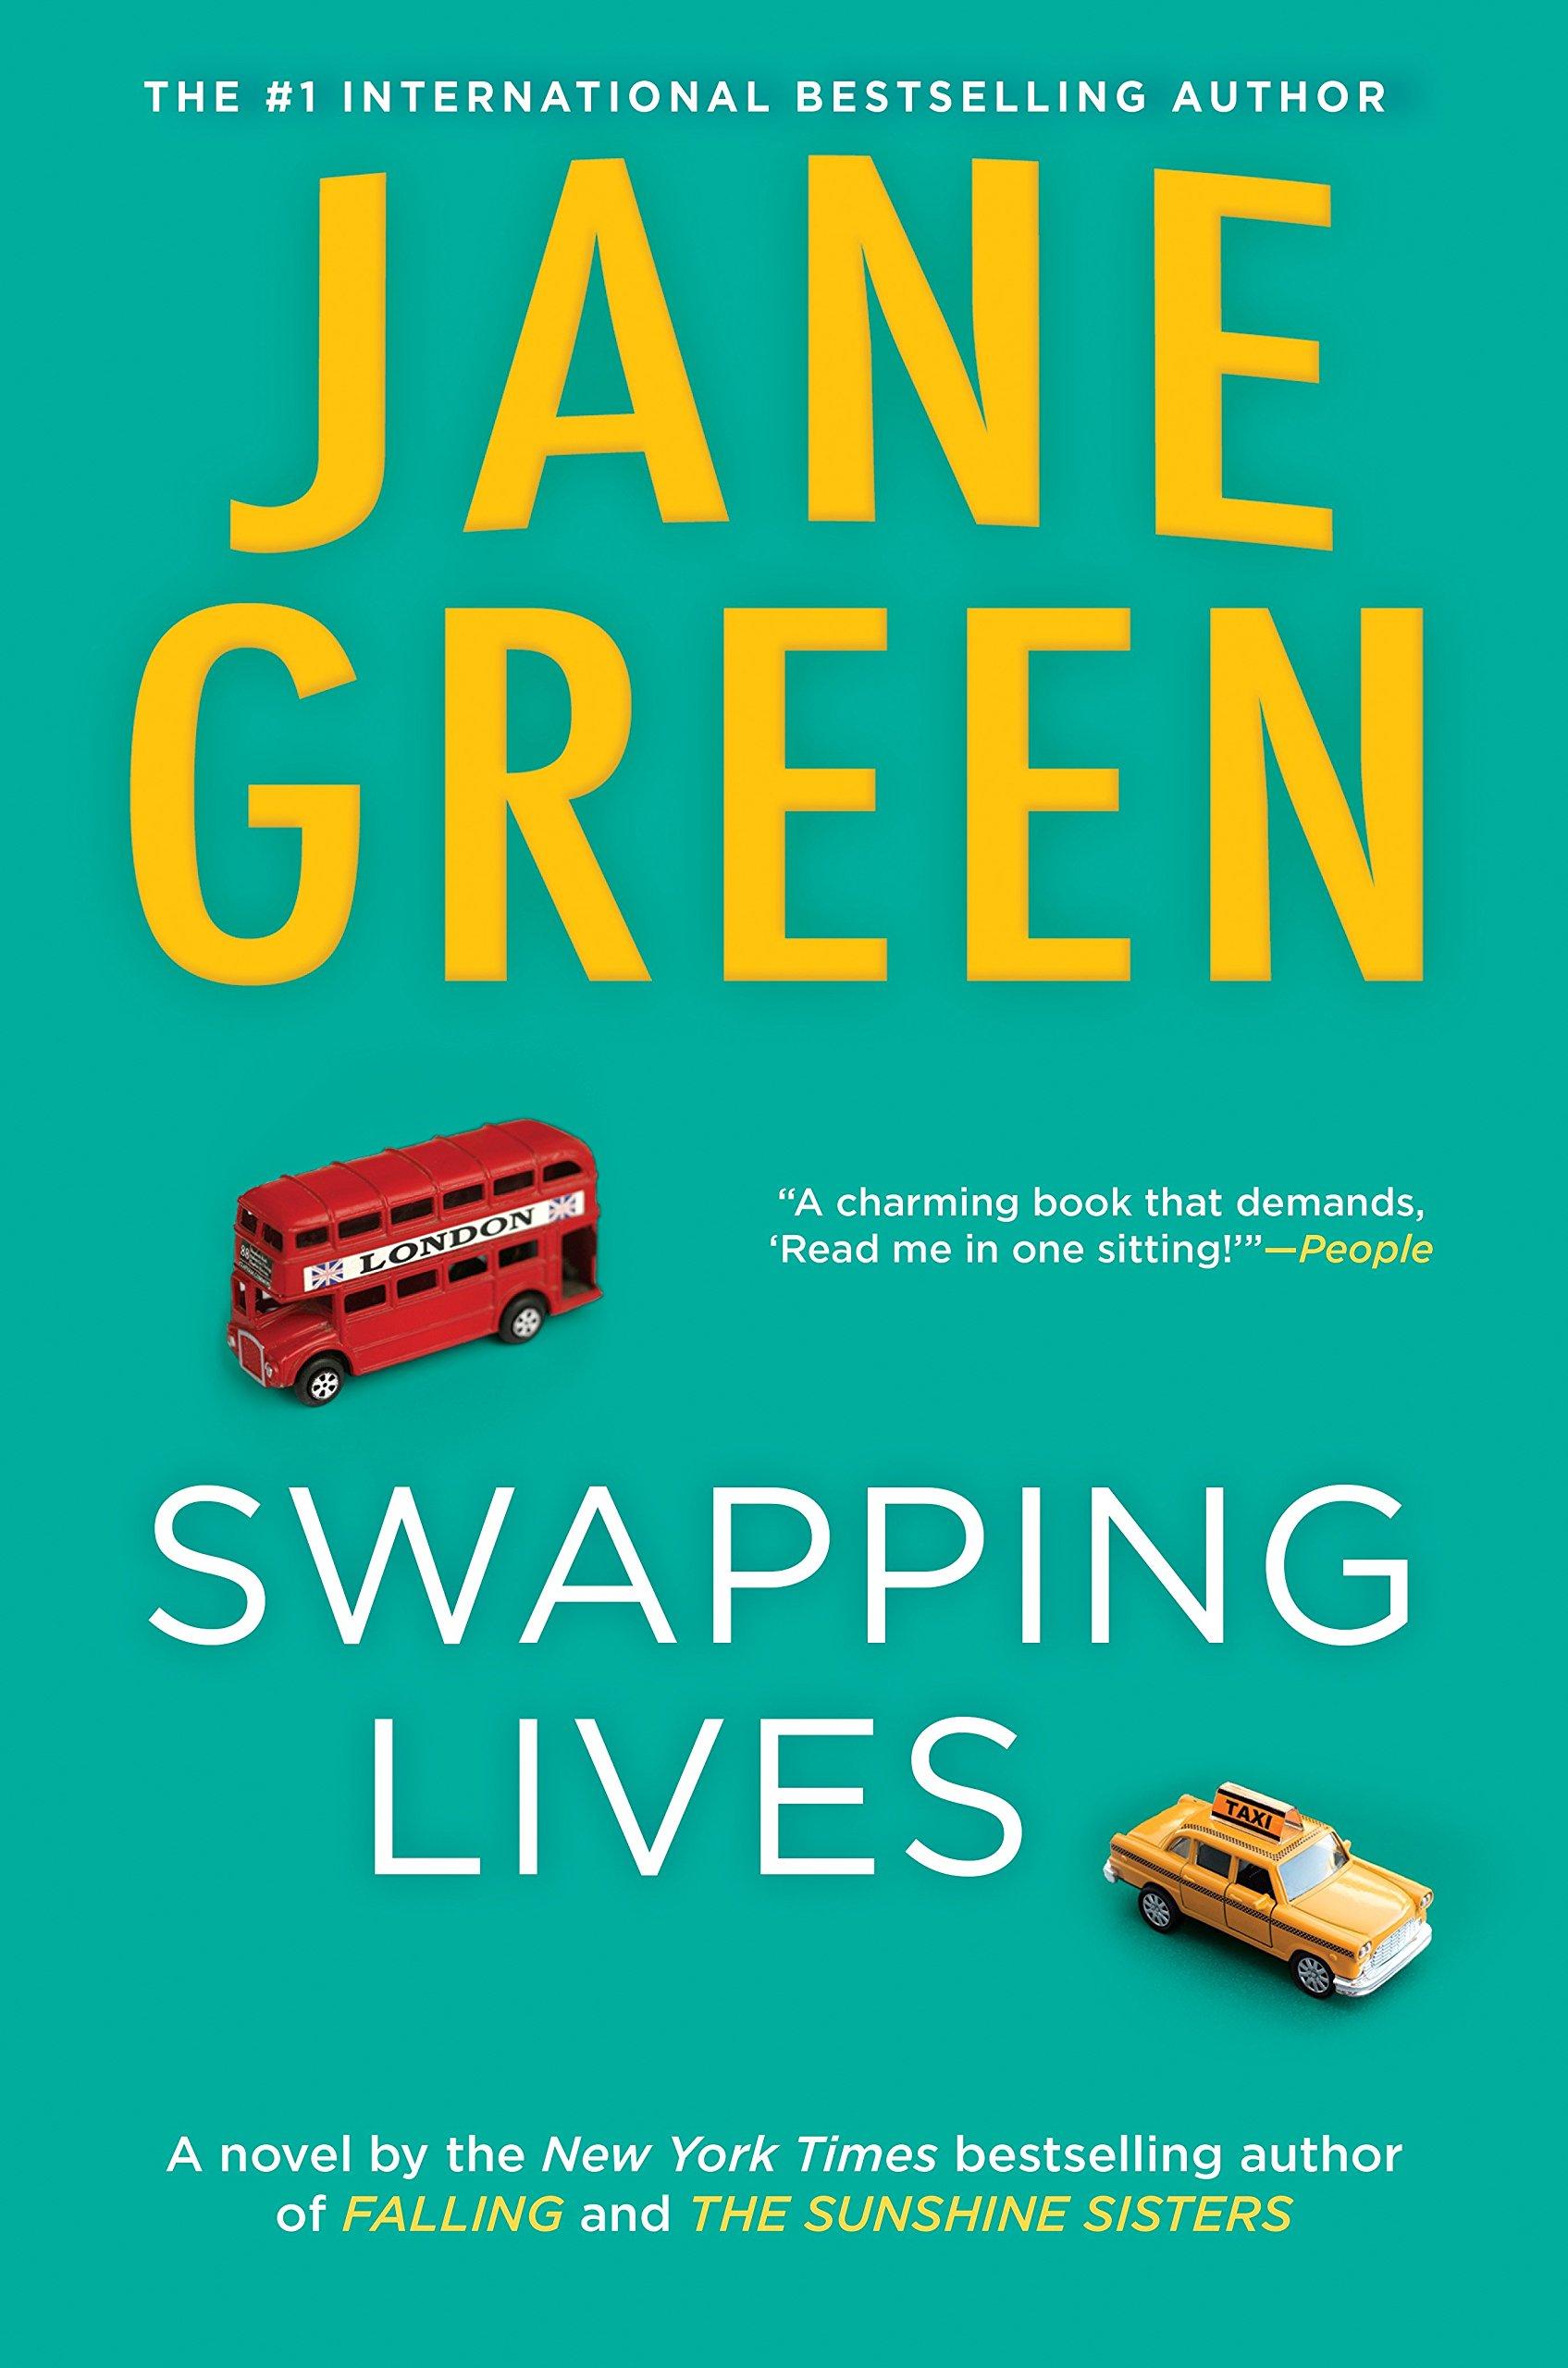 Redbook Reads: QA with Jane Green